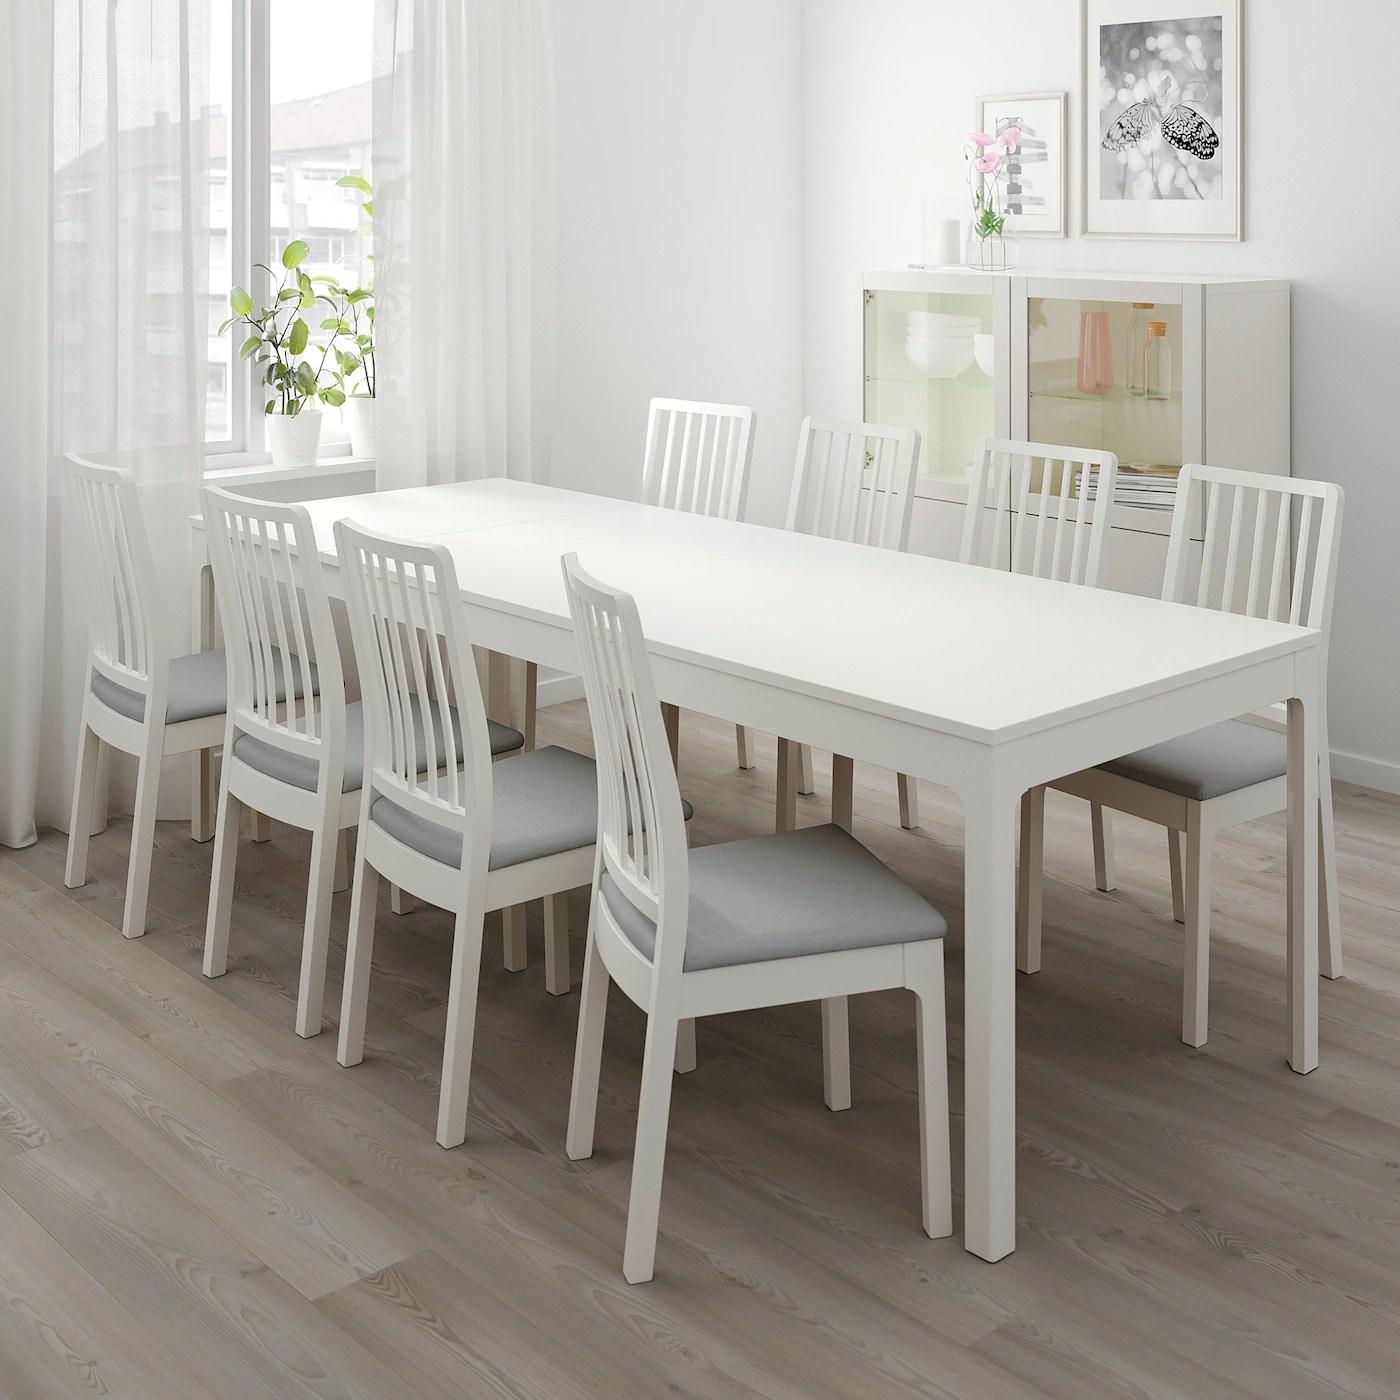 Ekedalen Ekedalen Table And 6 Chairs White Ramna Light Grey Ikea Ireland